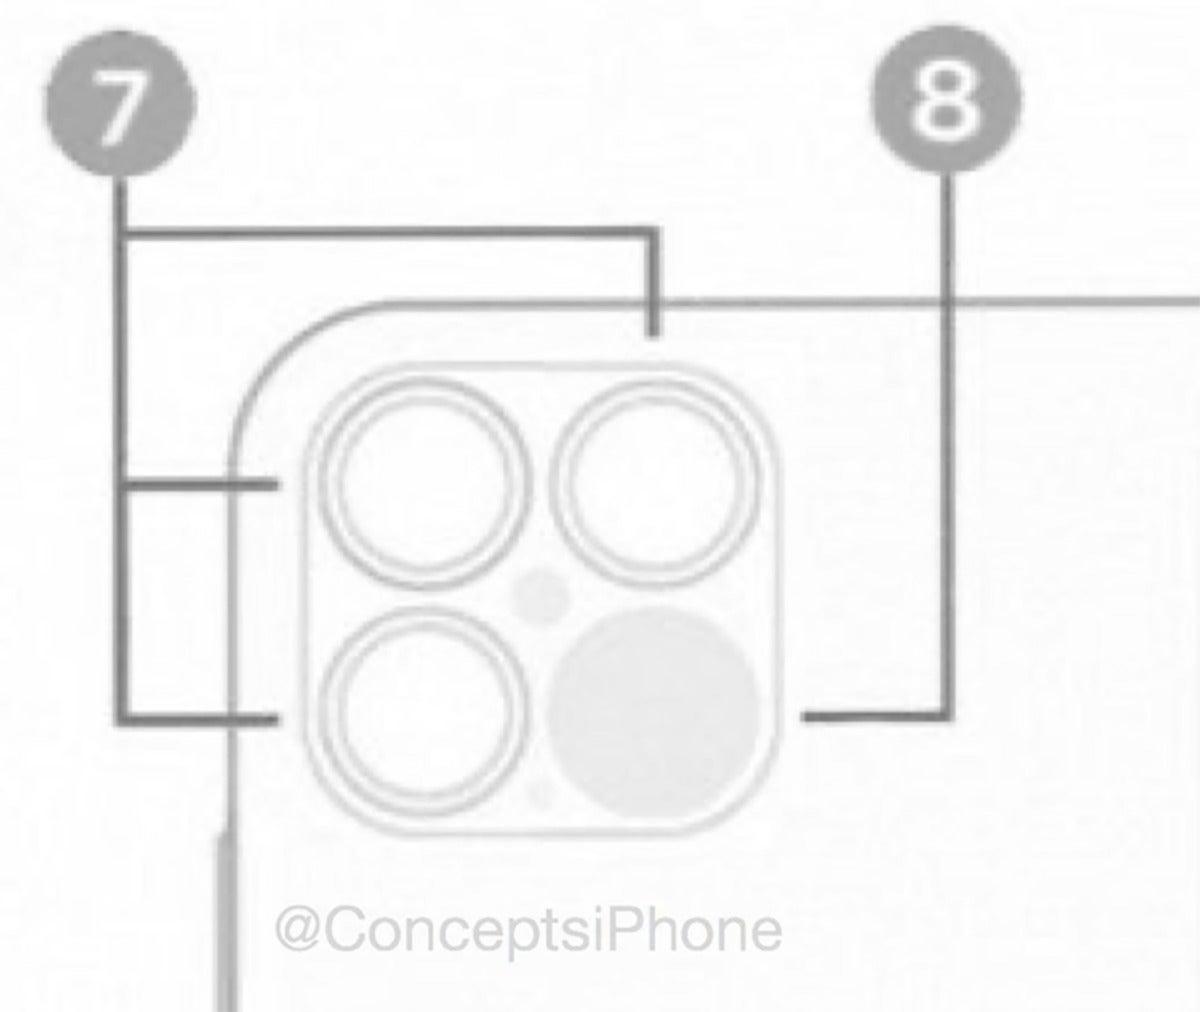 Iphone 12 Rumors 5g Oled Camera Processor Release